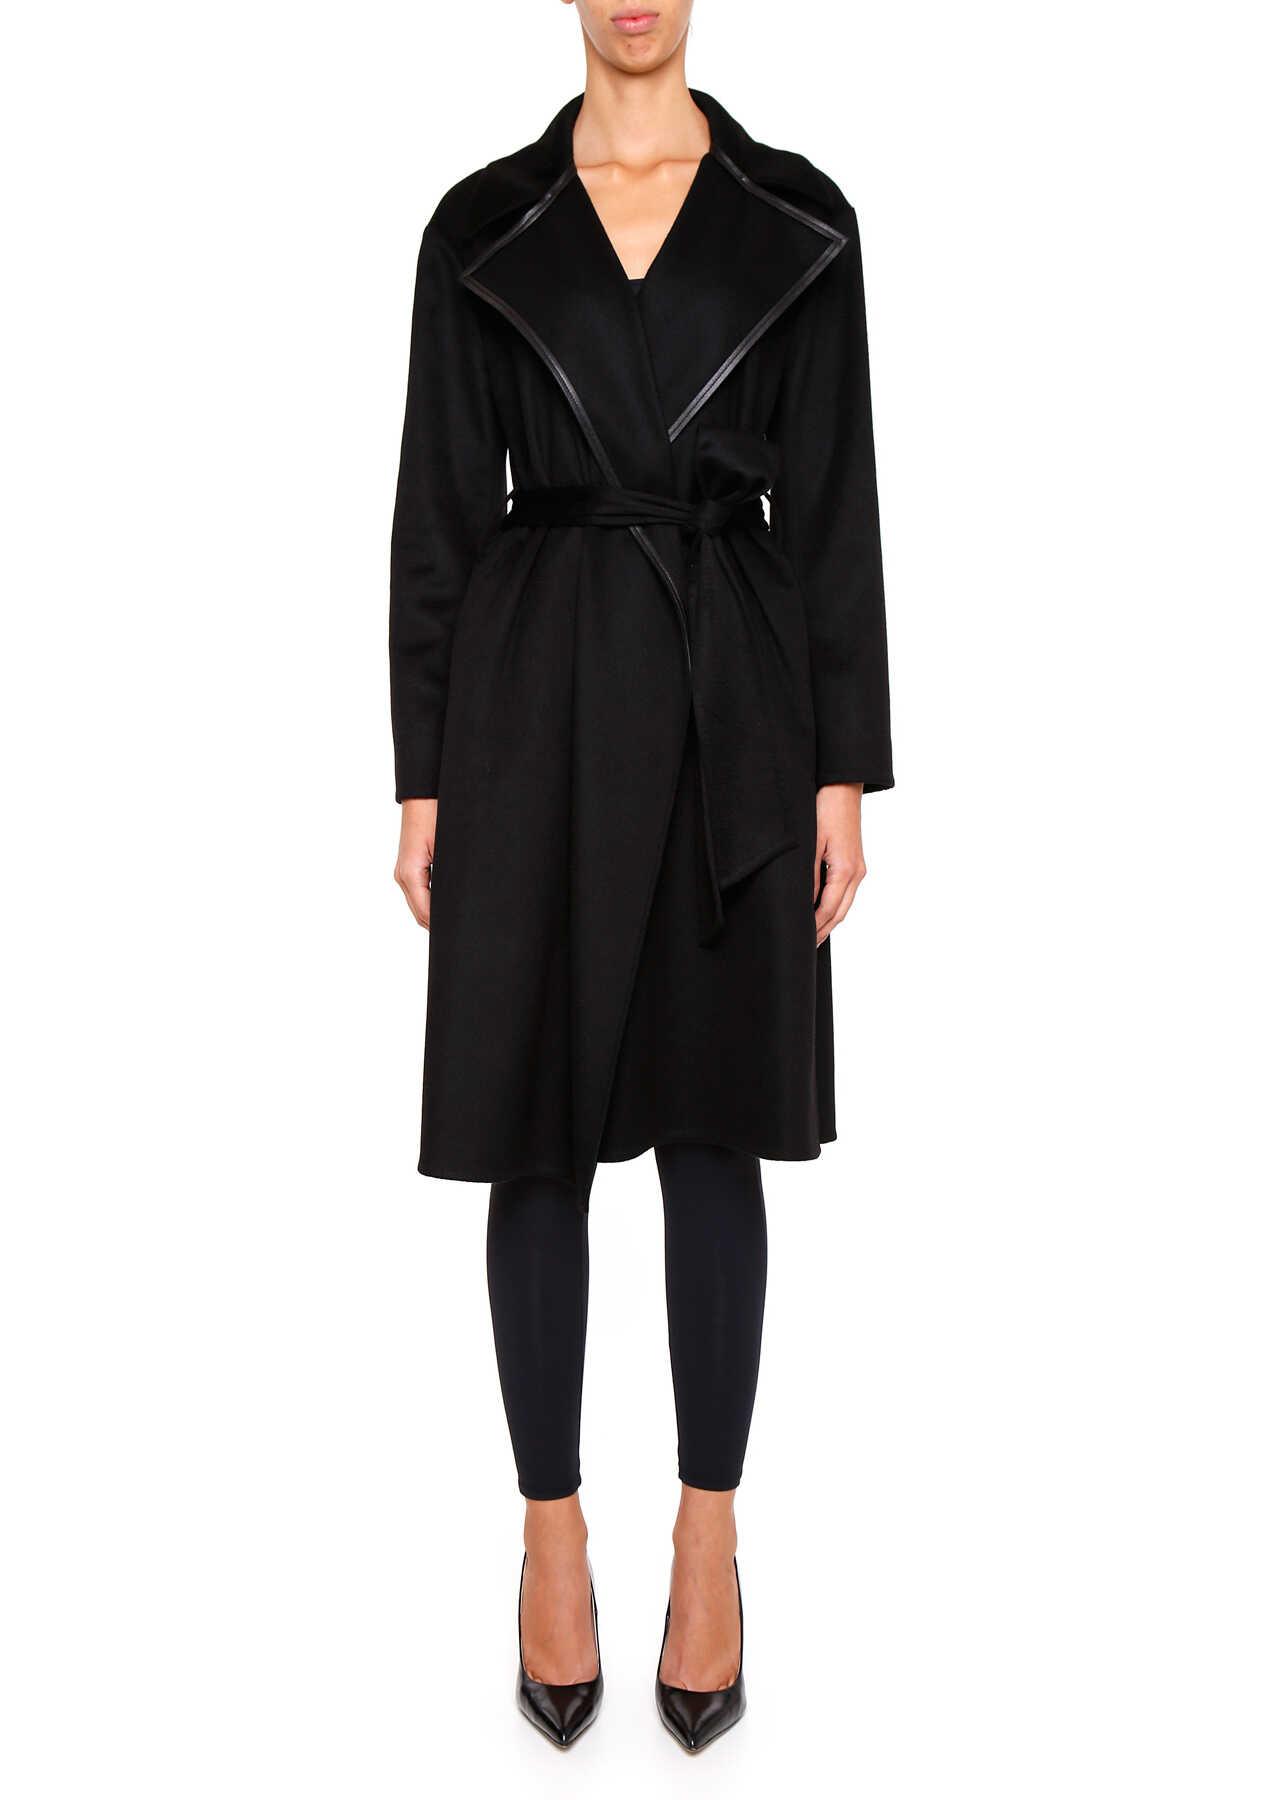 Tom Ford Coat BLACK